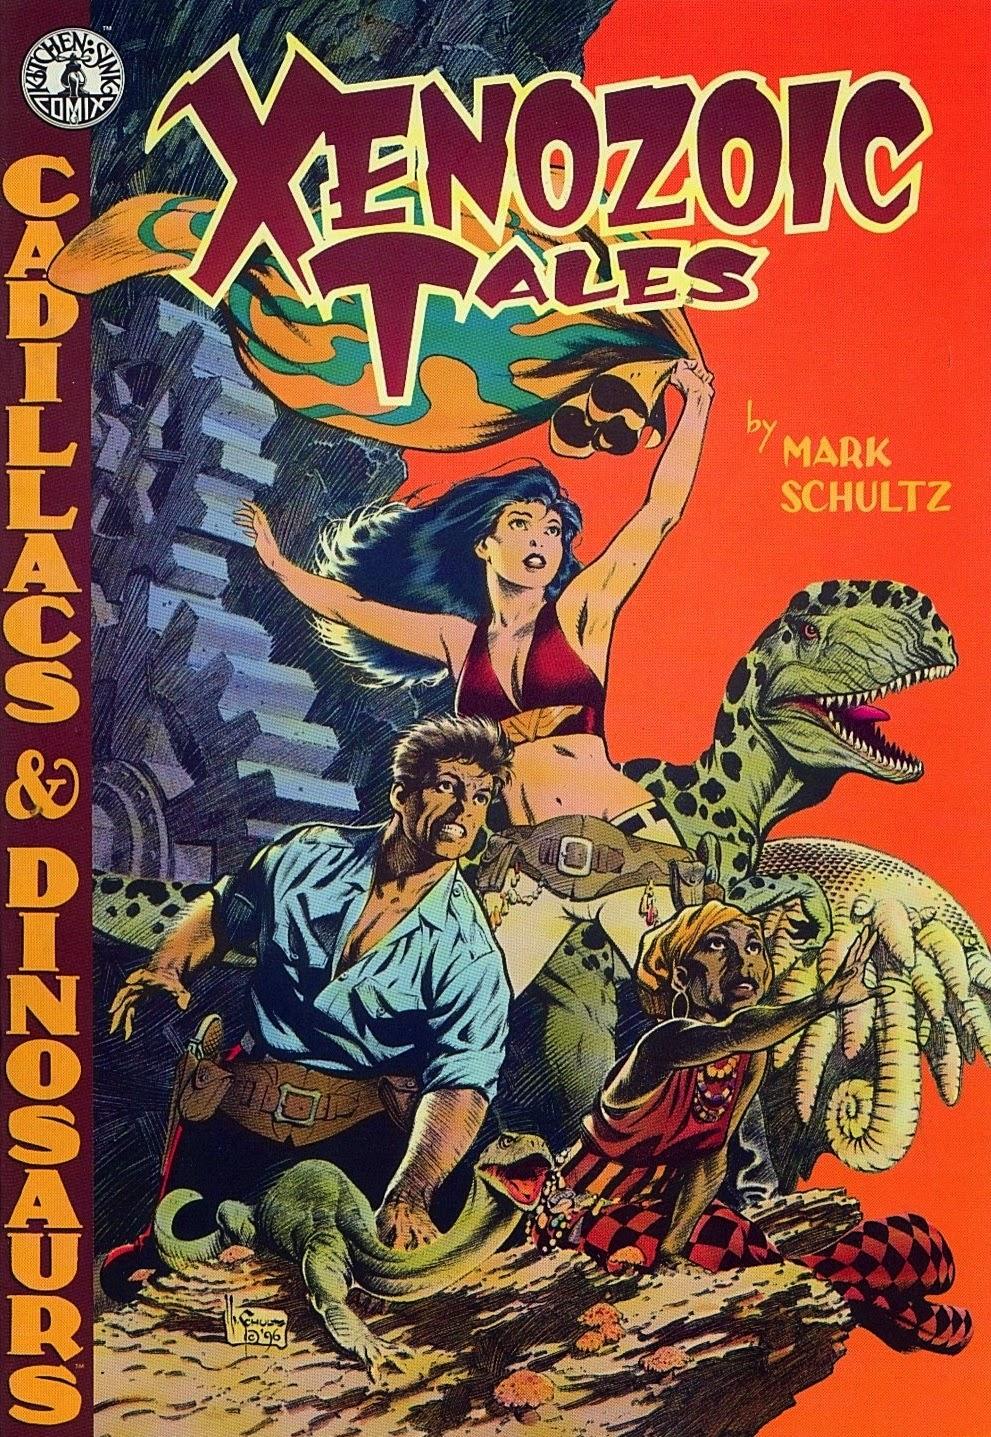 http://superheroesrevelados.blogspot.com.ar/2014/02/xenozoic-tales-cadillacs-dinosaurs.html